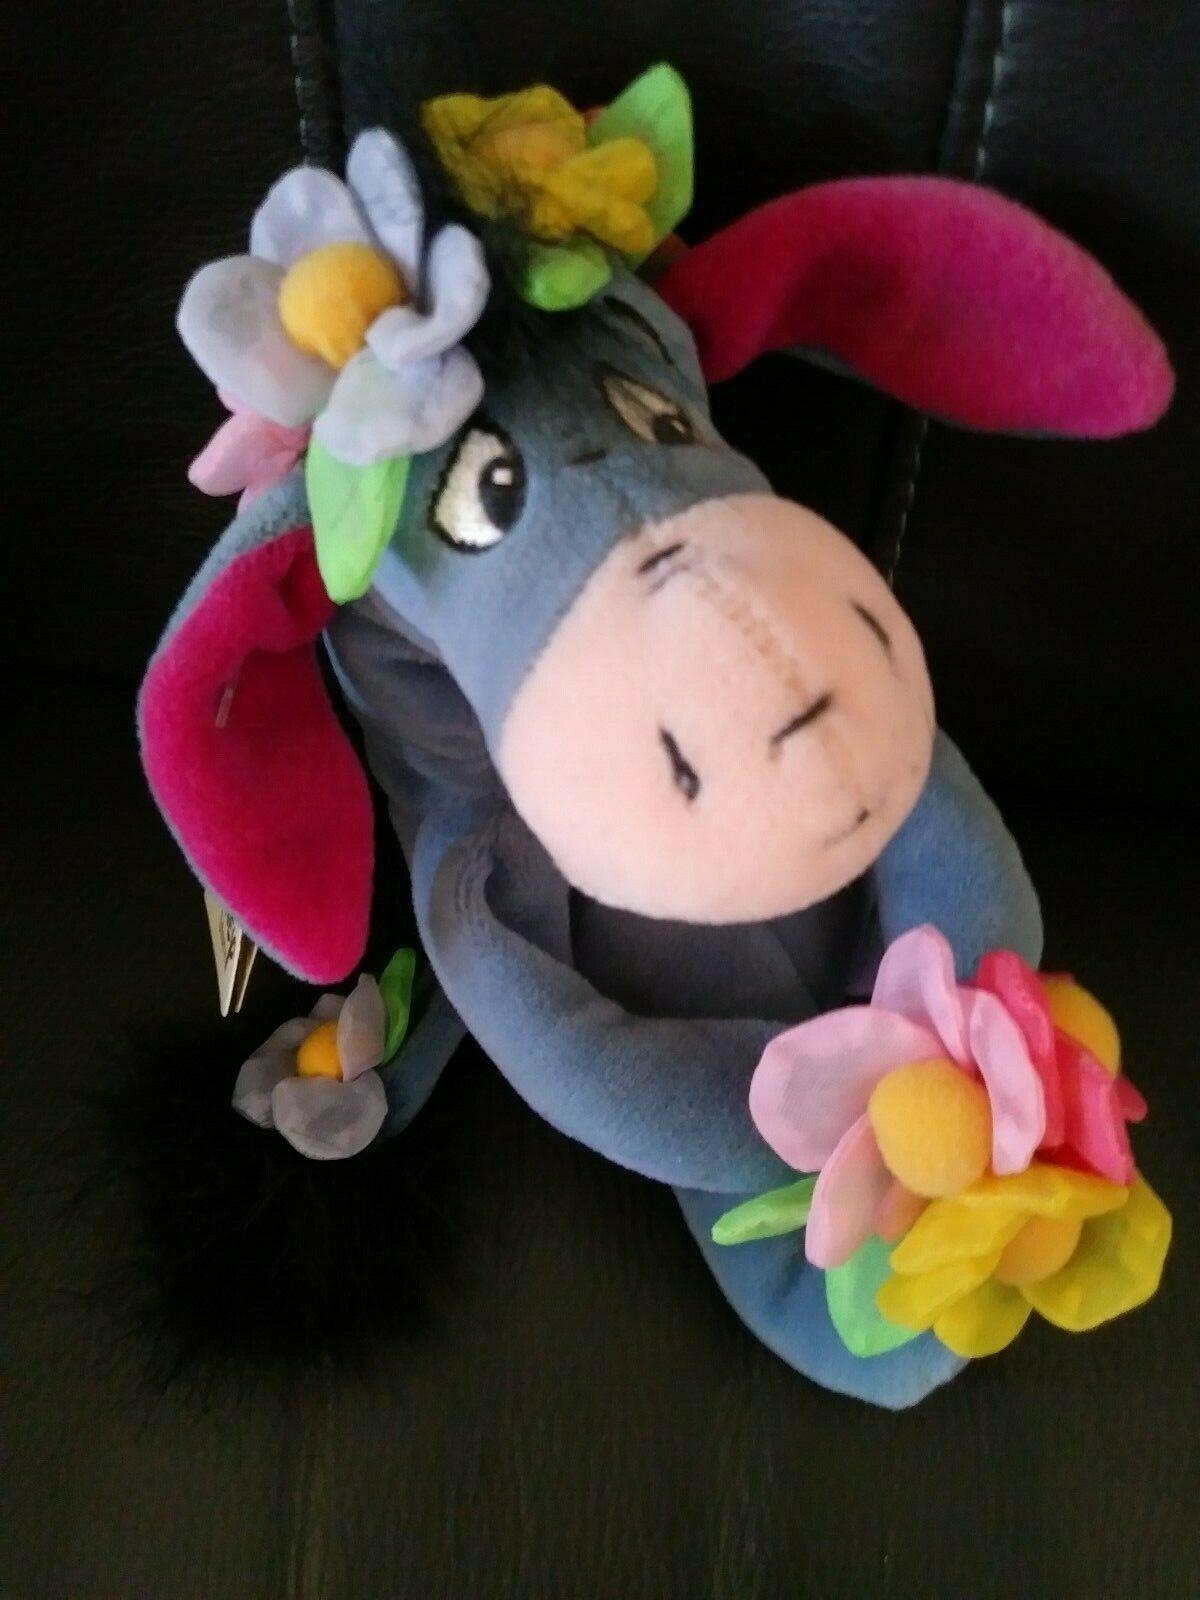 "Disney Winnie the Pooh FLOWER POWER EEYORE 9"" Bean Bag STUFFED ANIMAL Toy w/tags"